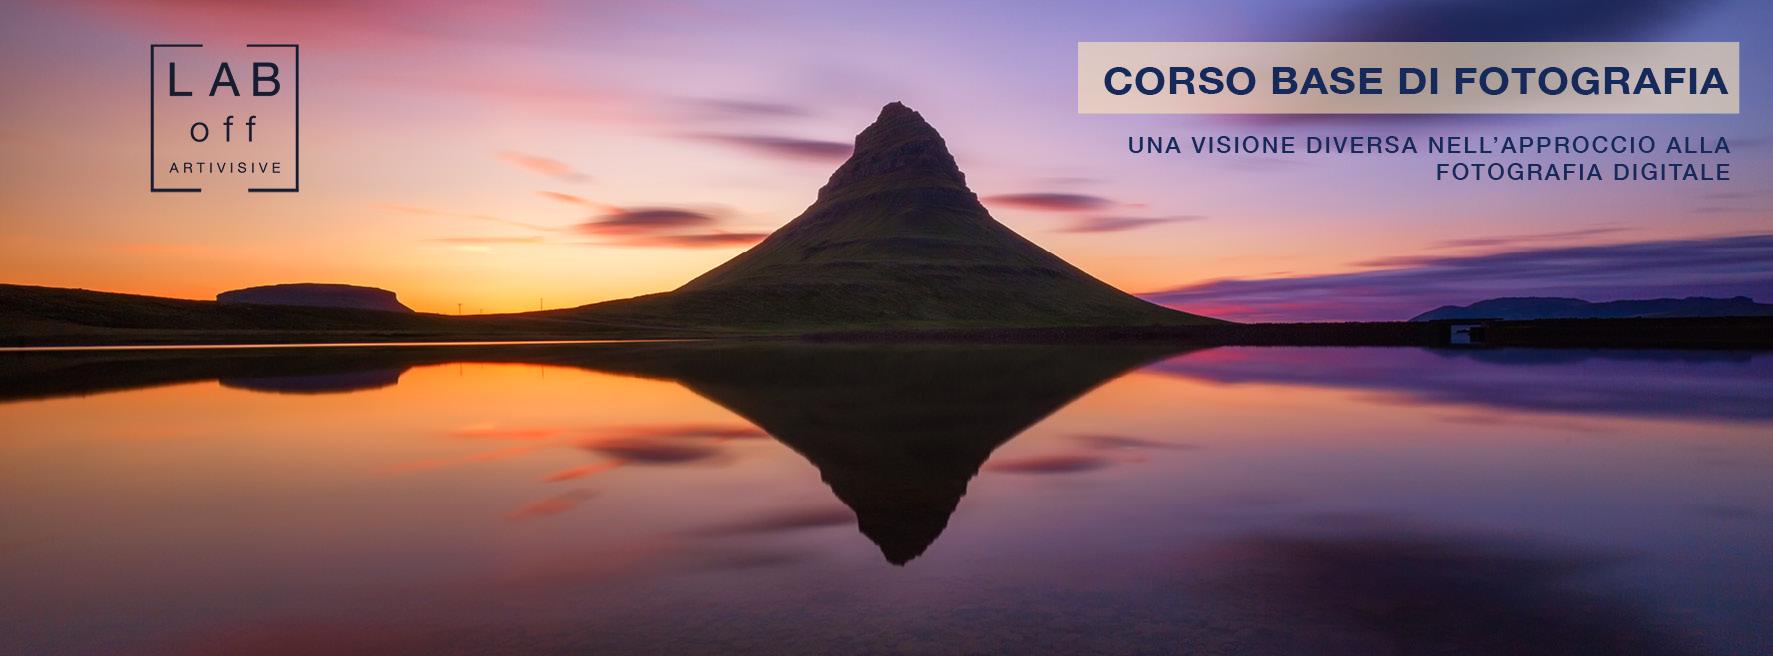 Corso-base-fotografia-2016